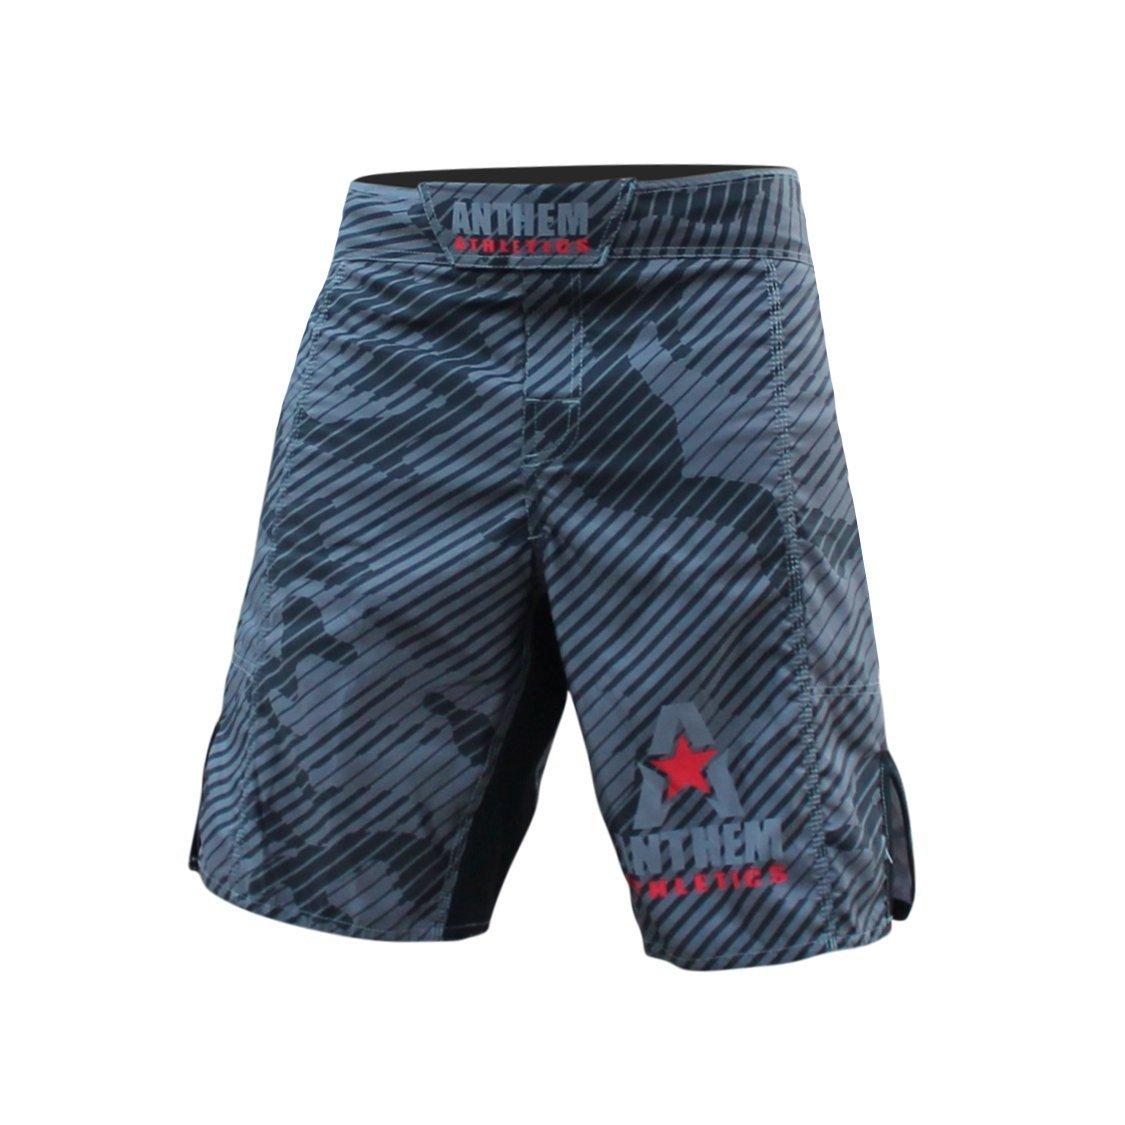 Anthem Athletics RESILIENCE MMA Shorts - Grey Line Camo - 30''